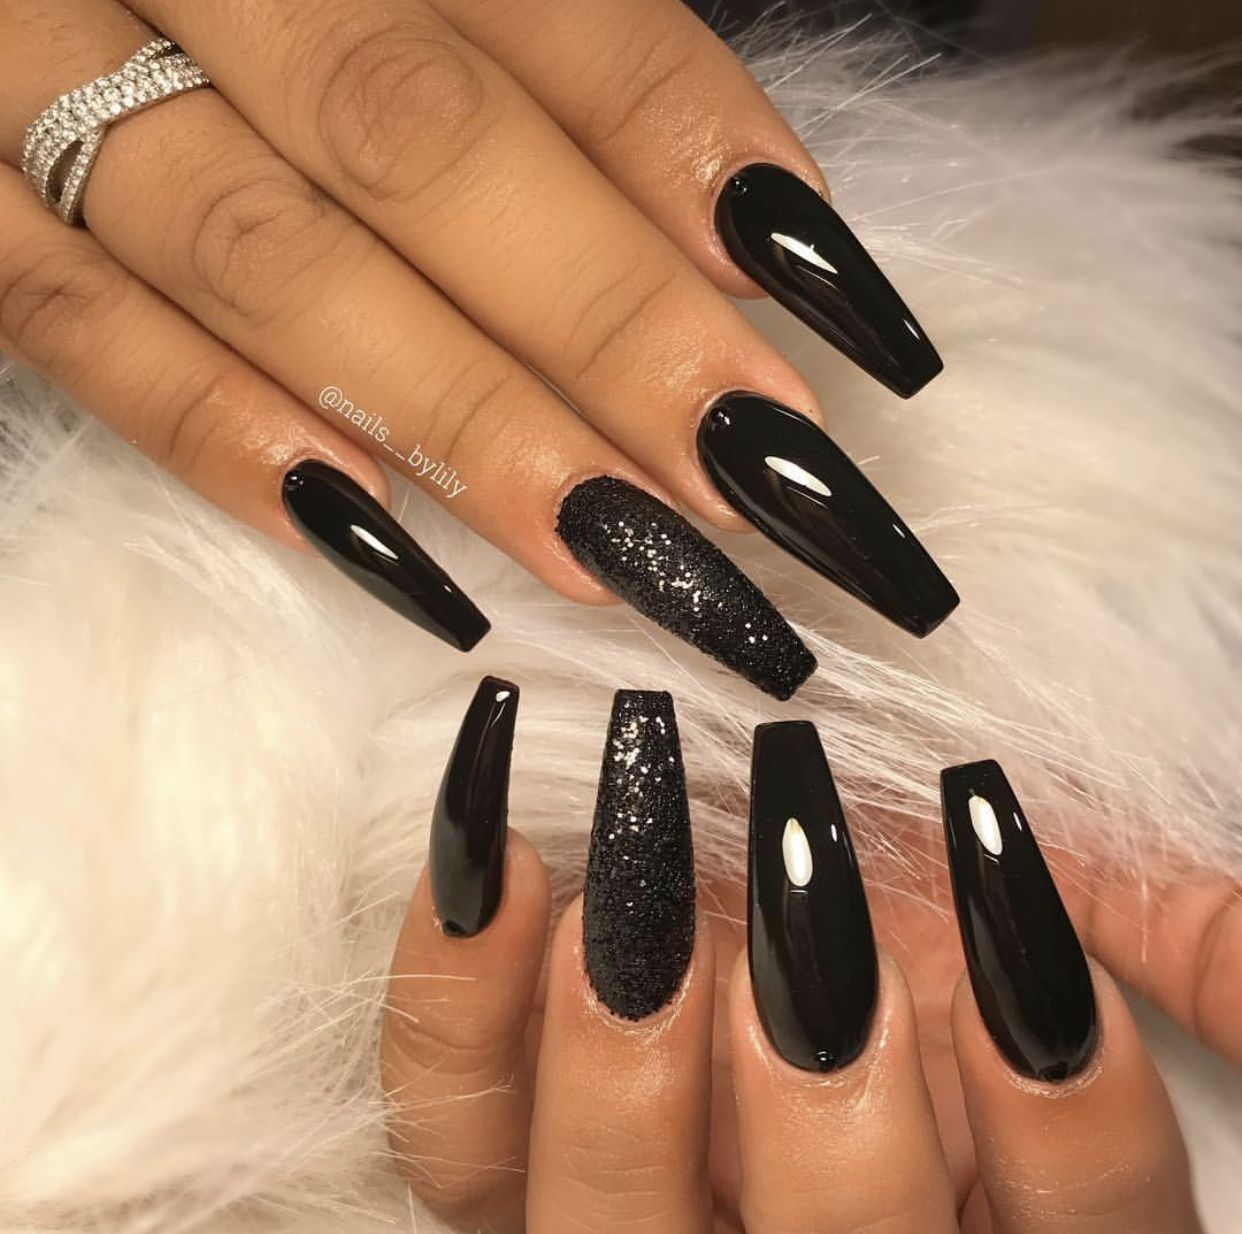 Check Out Simonelovee Cute Acrylic Nail Designs Acrylic Nail Designs Black Acrylic Nails